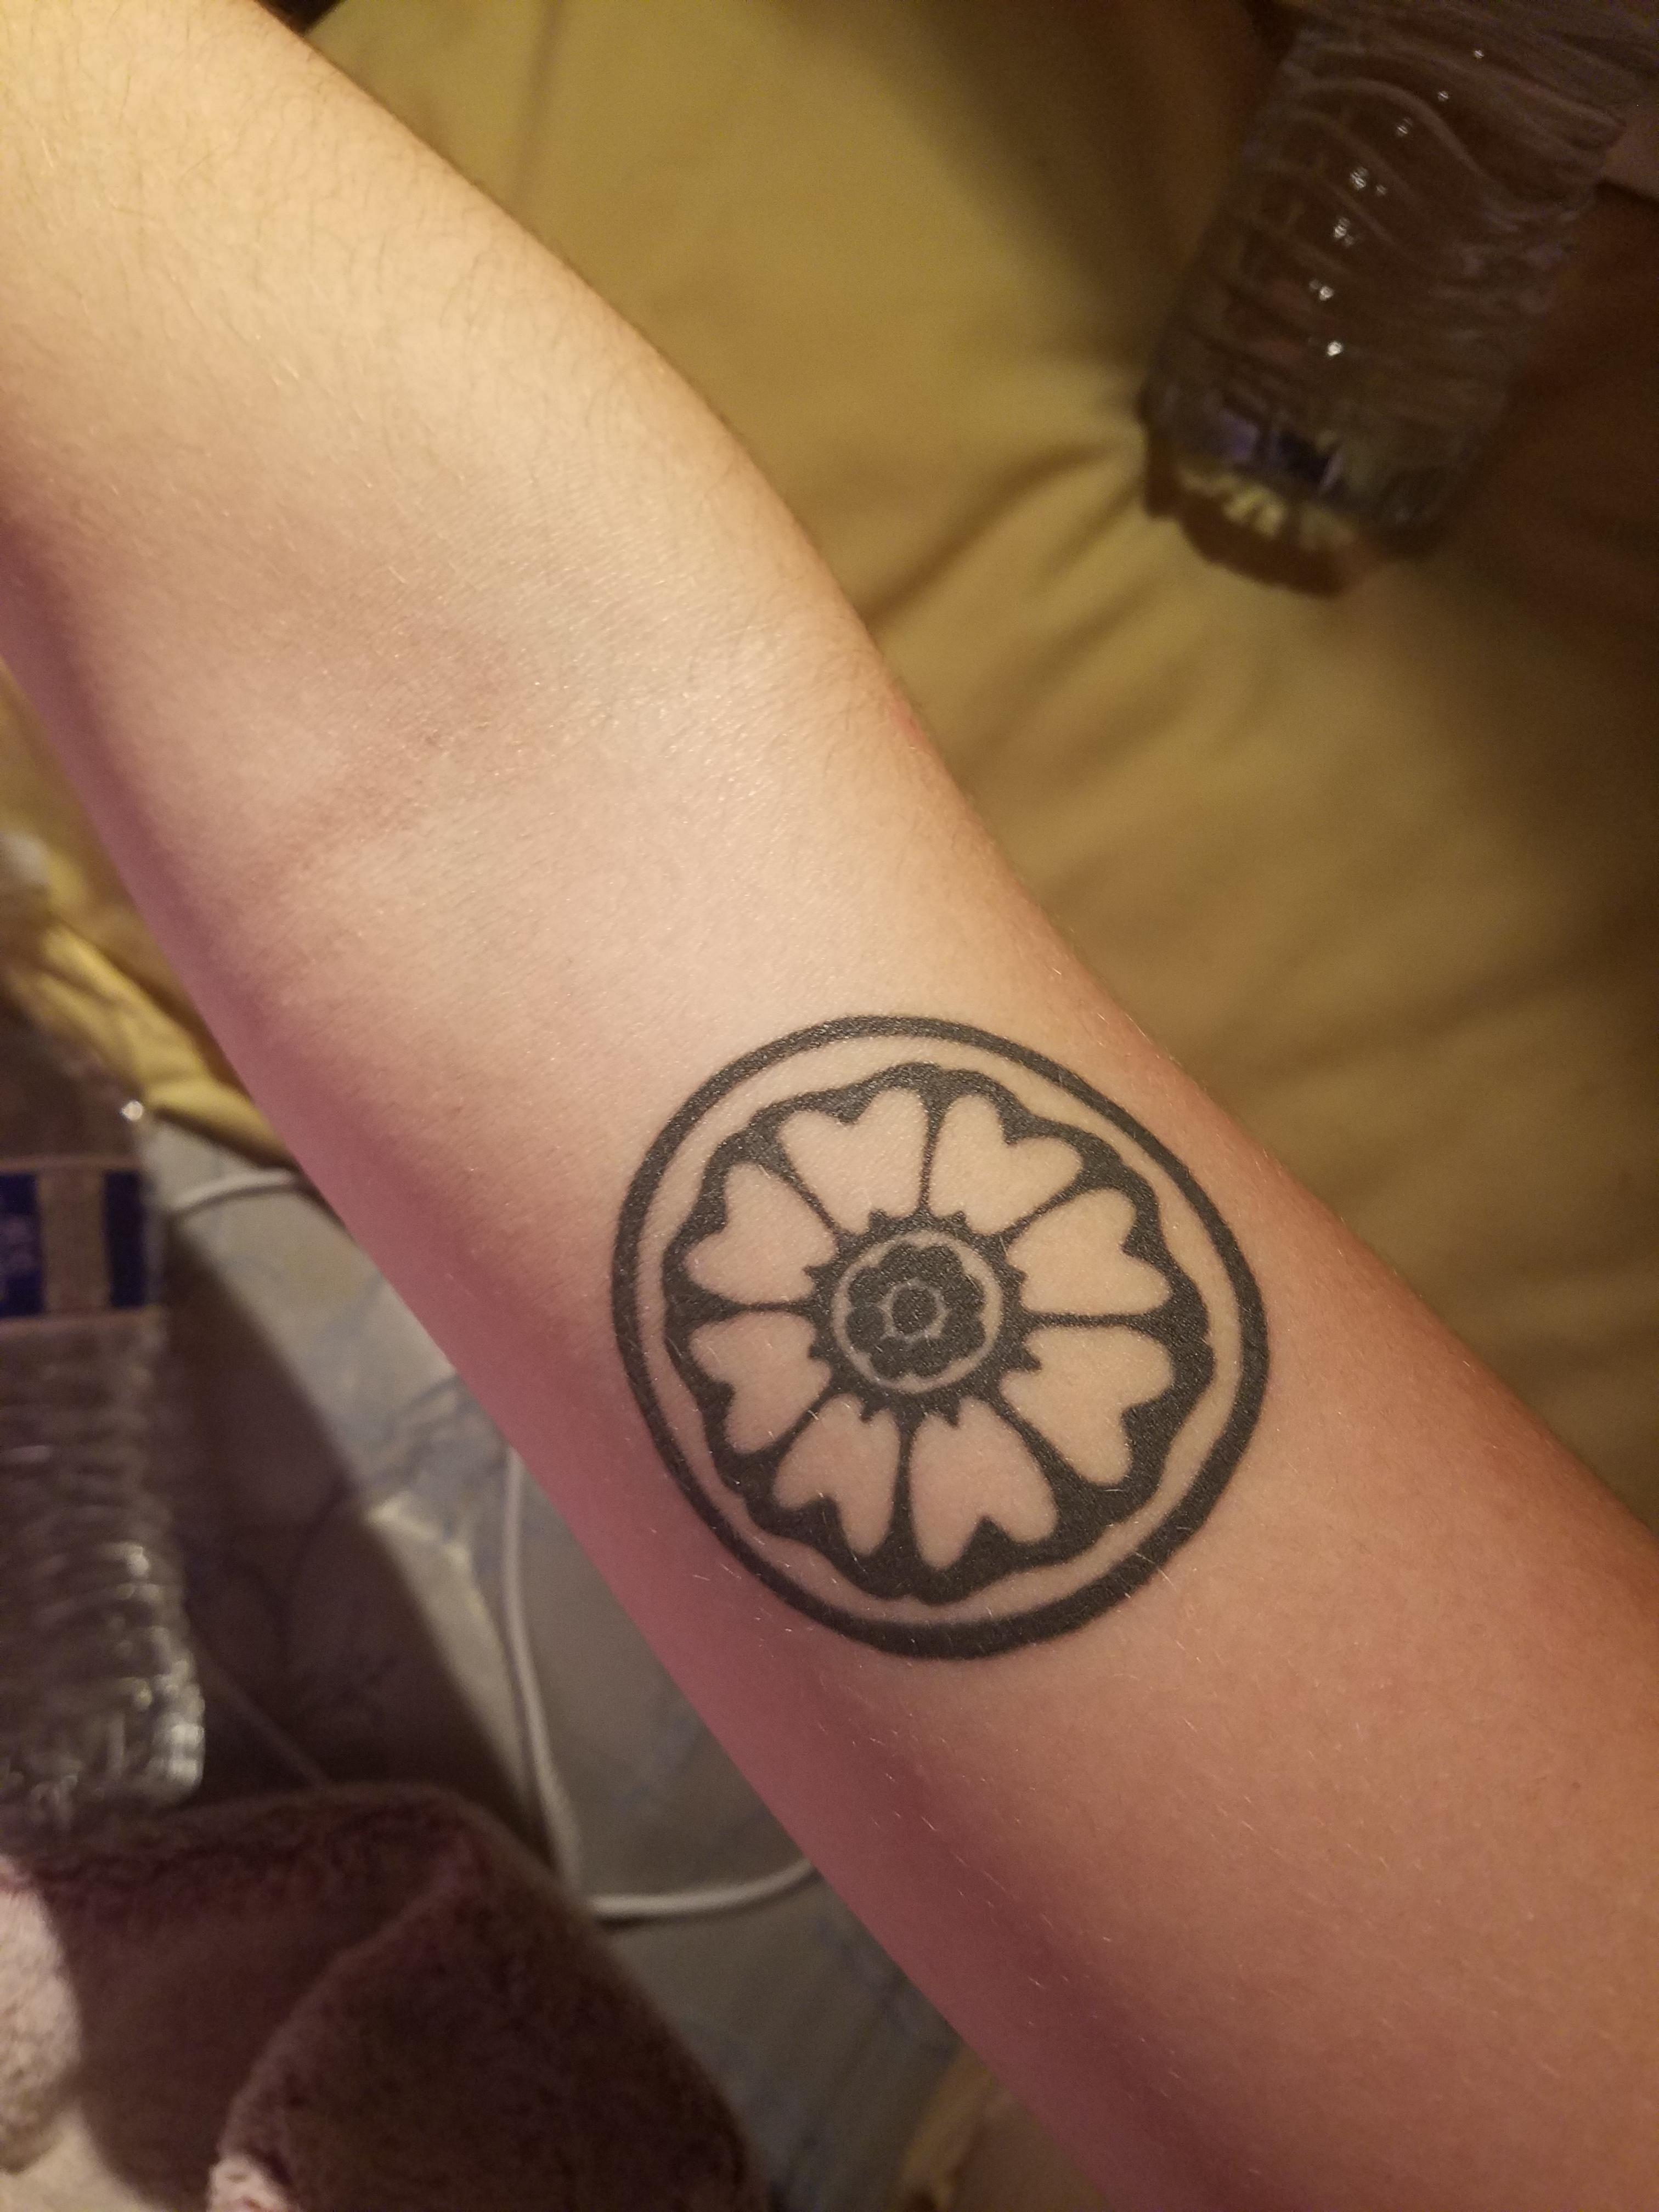 White Lotus Tile Tattoo : white, lotus, tattoo, Uncle, Iroh's, White, Lotus, Tile., Oscar, Garcia, Heart, Gold., Utah., Tattoos,, Tattoo,, Avatar, Tattoo